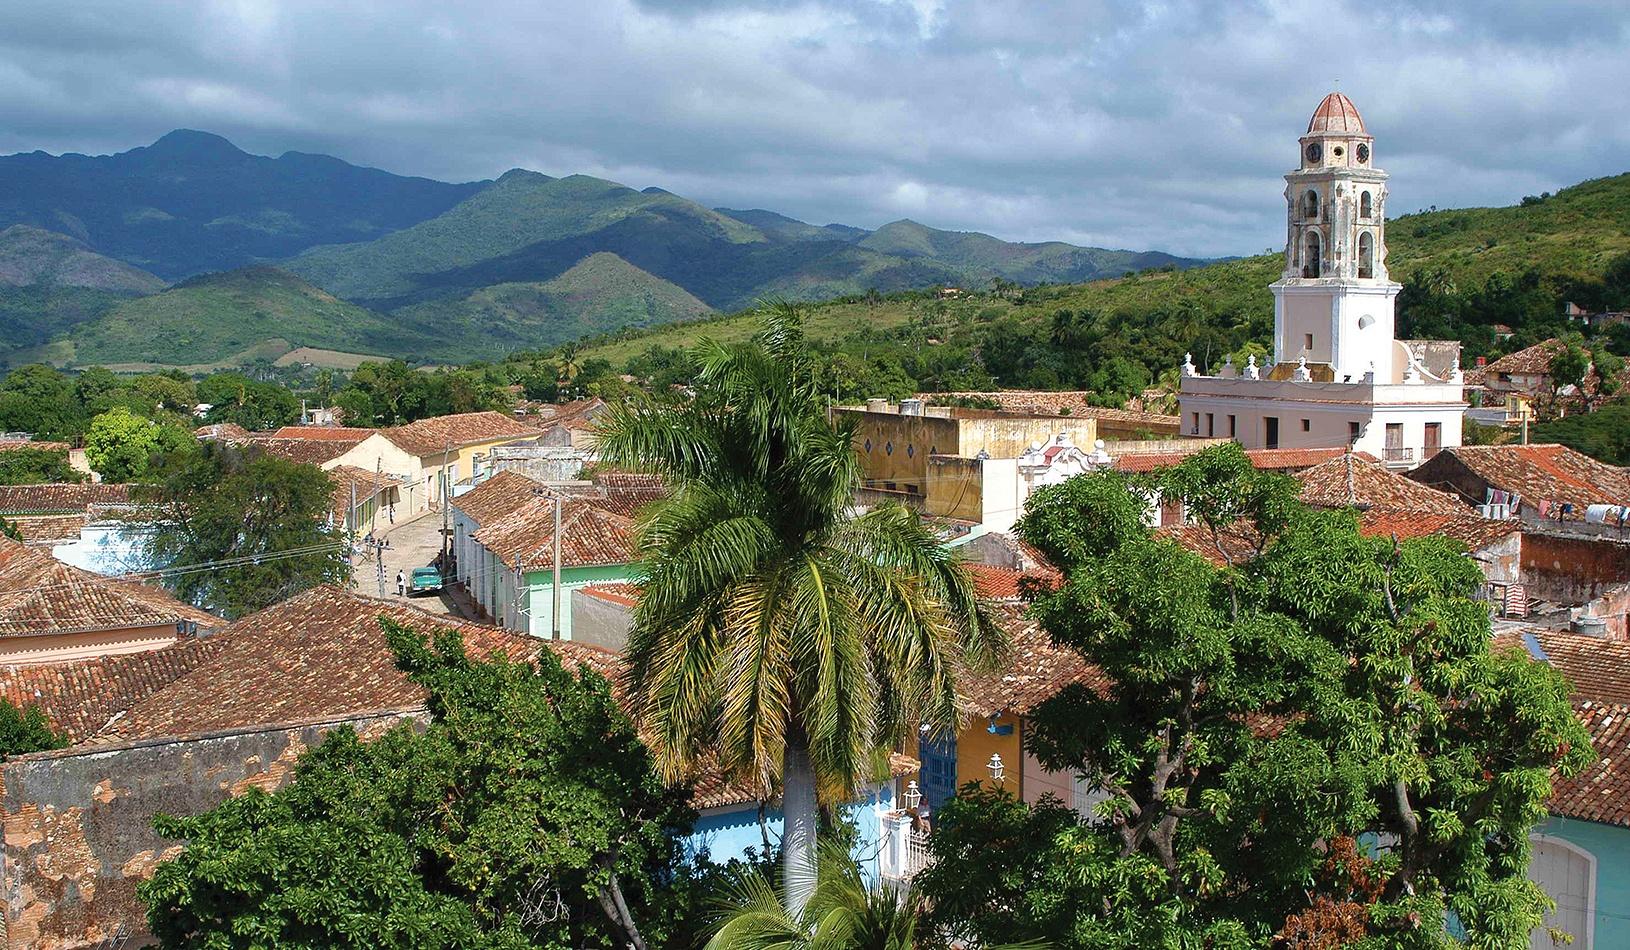 View of Trinidad